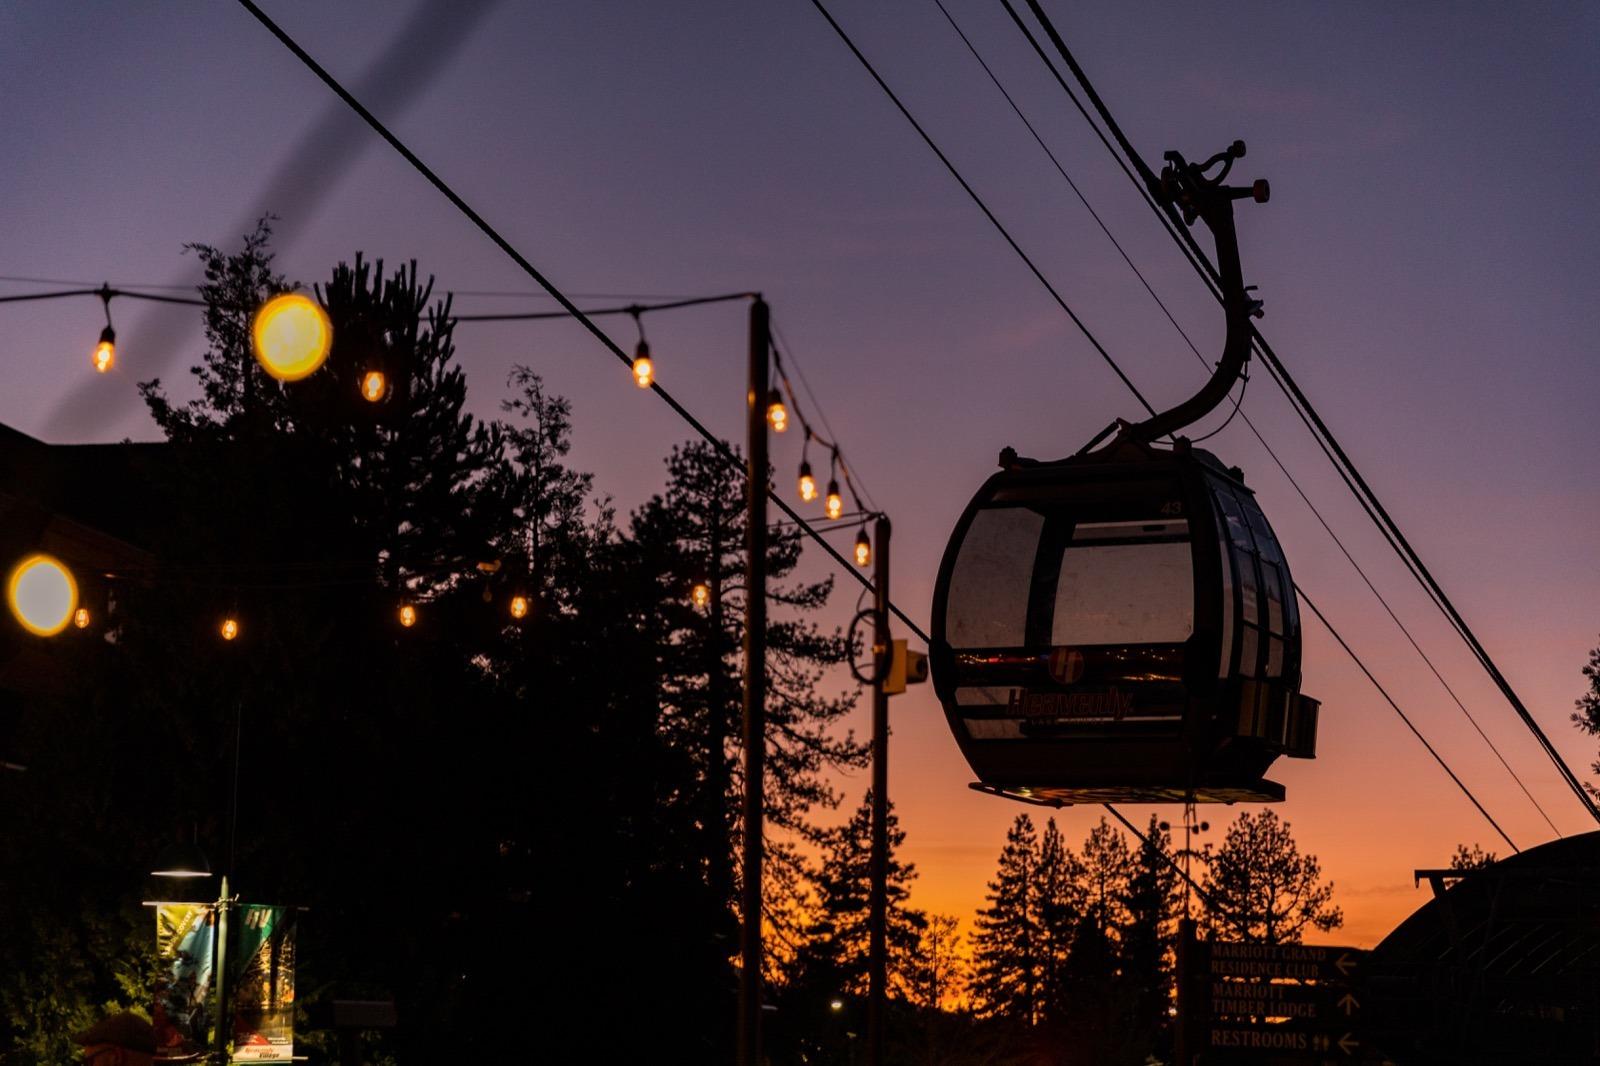 california-high-sierra-south-lake-tahoe-heavenly-village-gondola-sunset